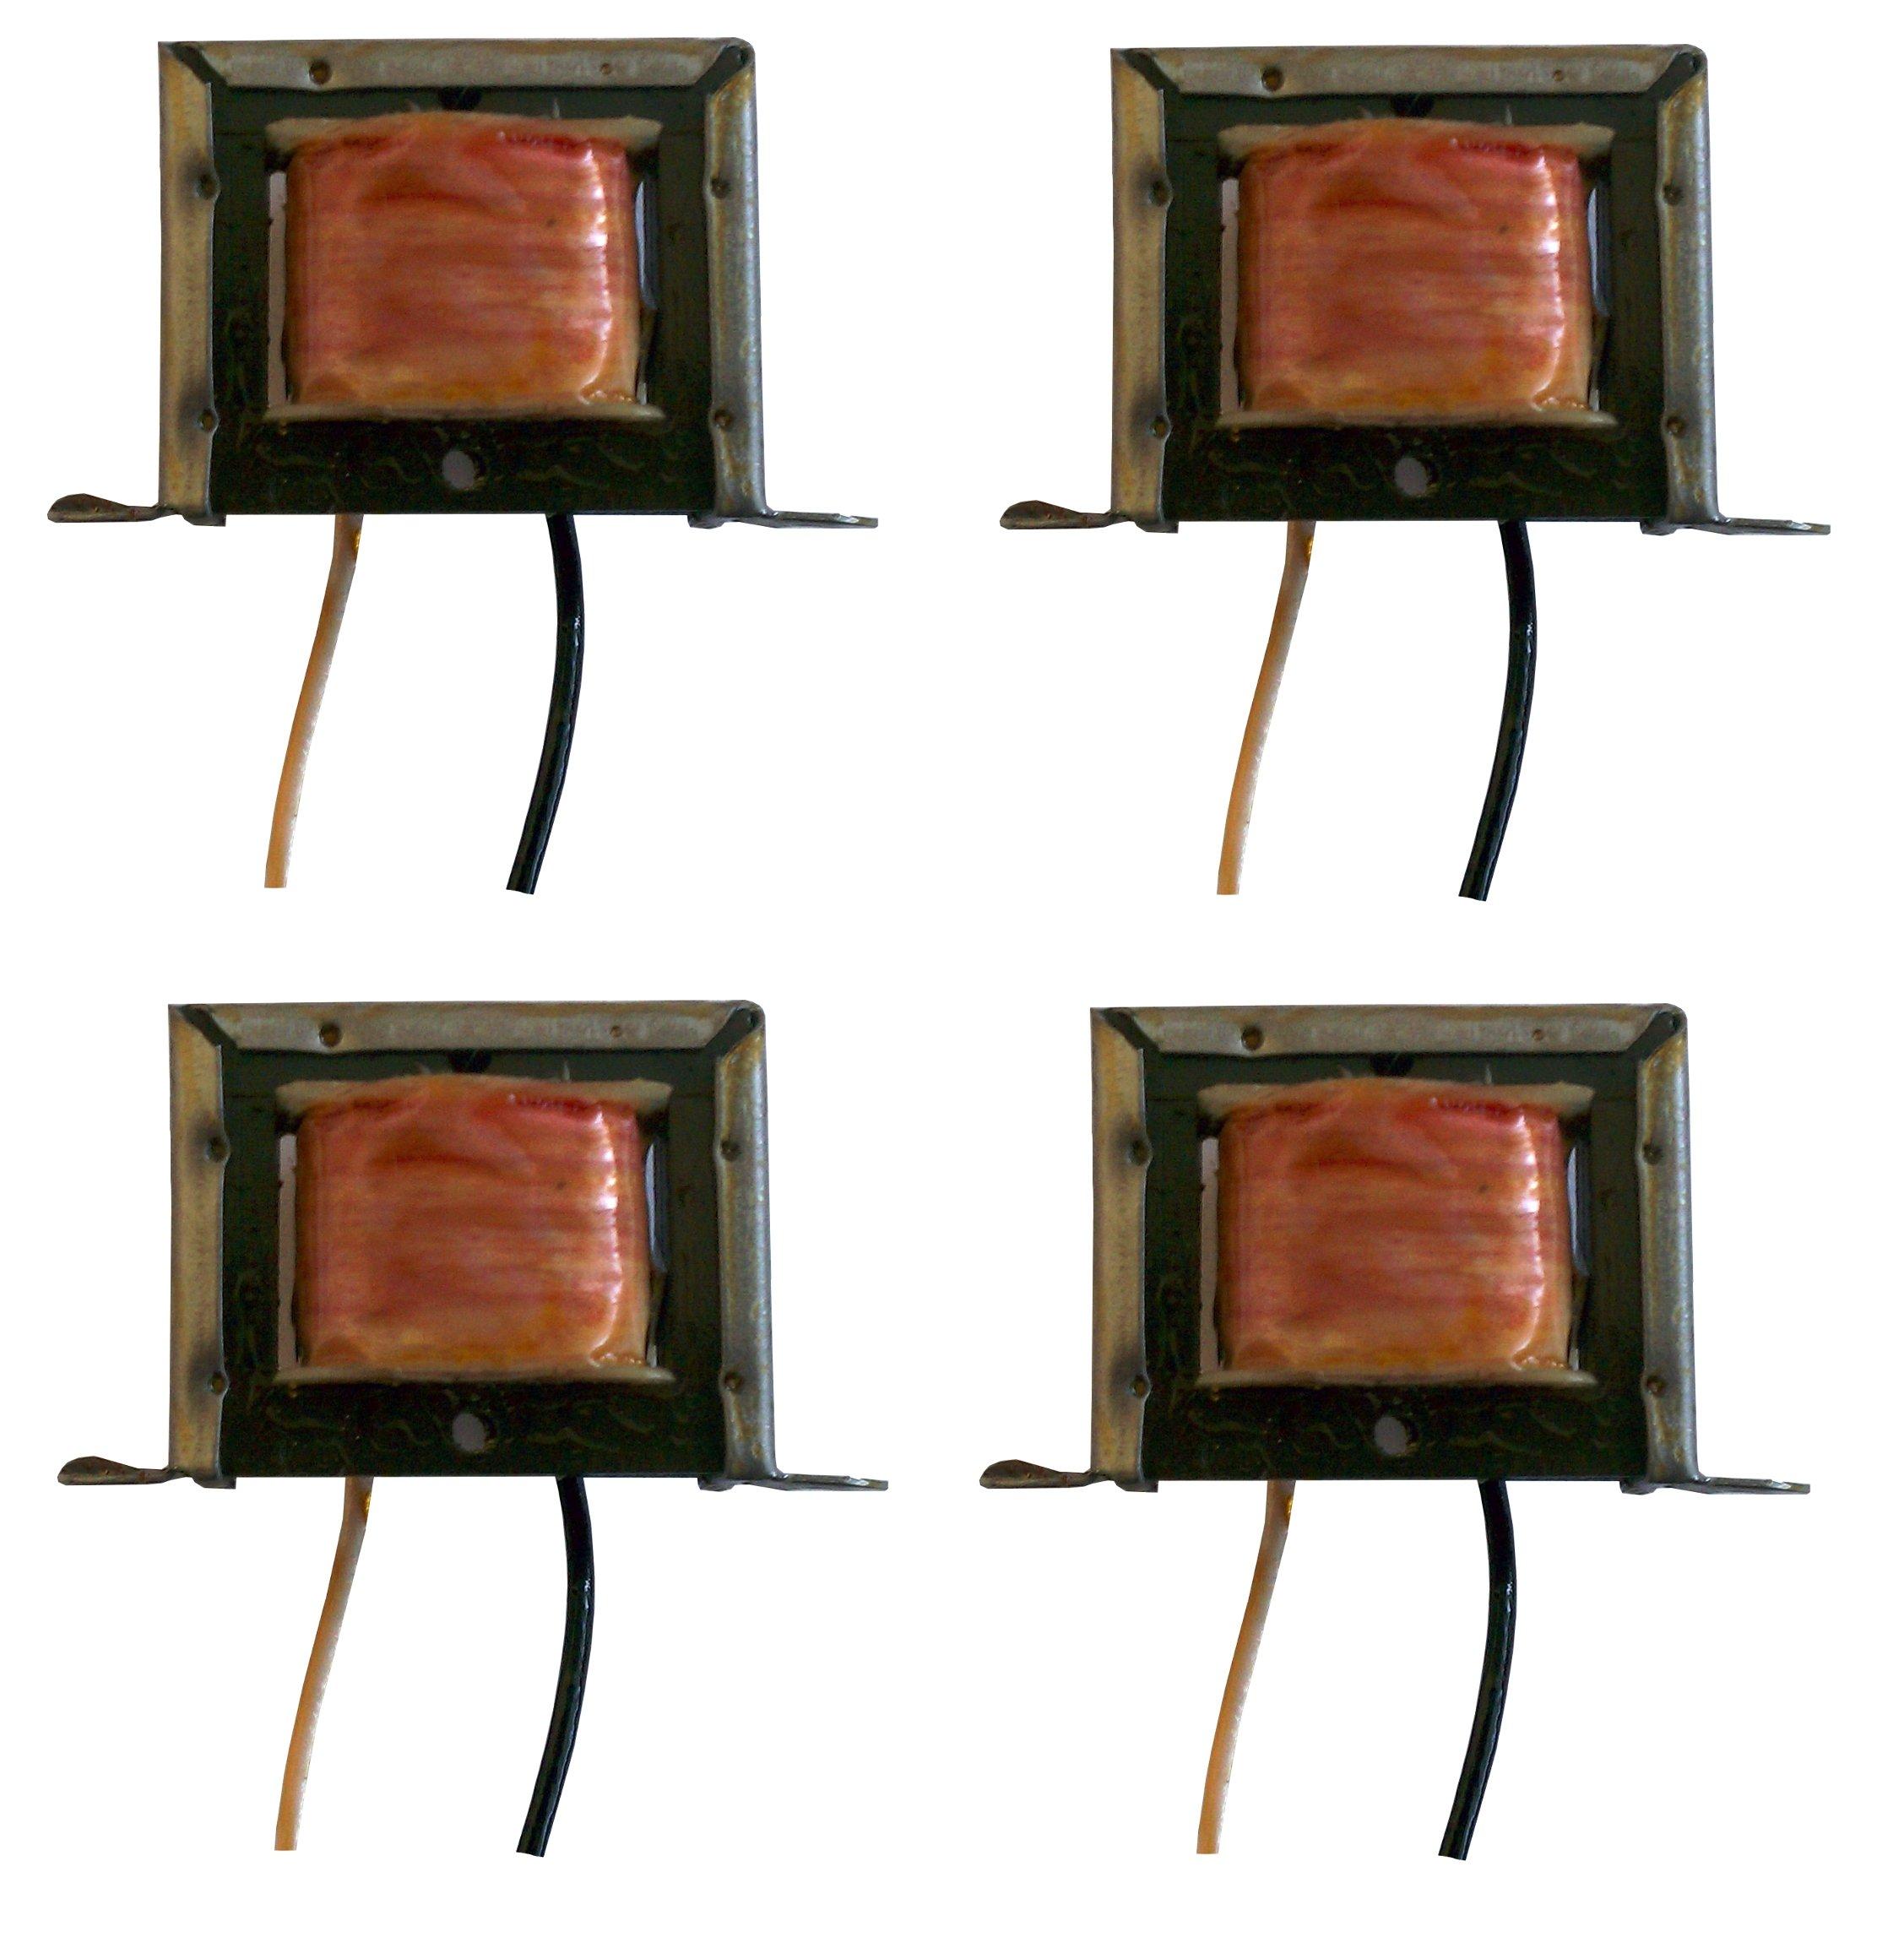 120-Volt 1-Lamp F8T5 Normal Power Factor Magnetic Ballast (4-Pack)-Radionic Hi Tech Inc.